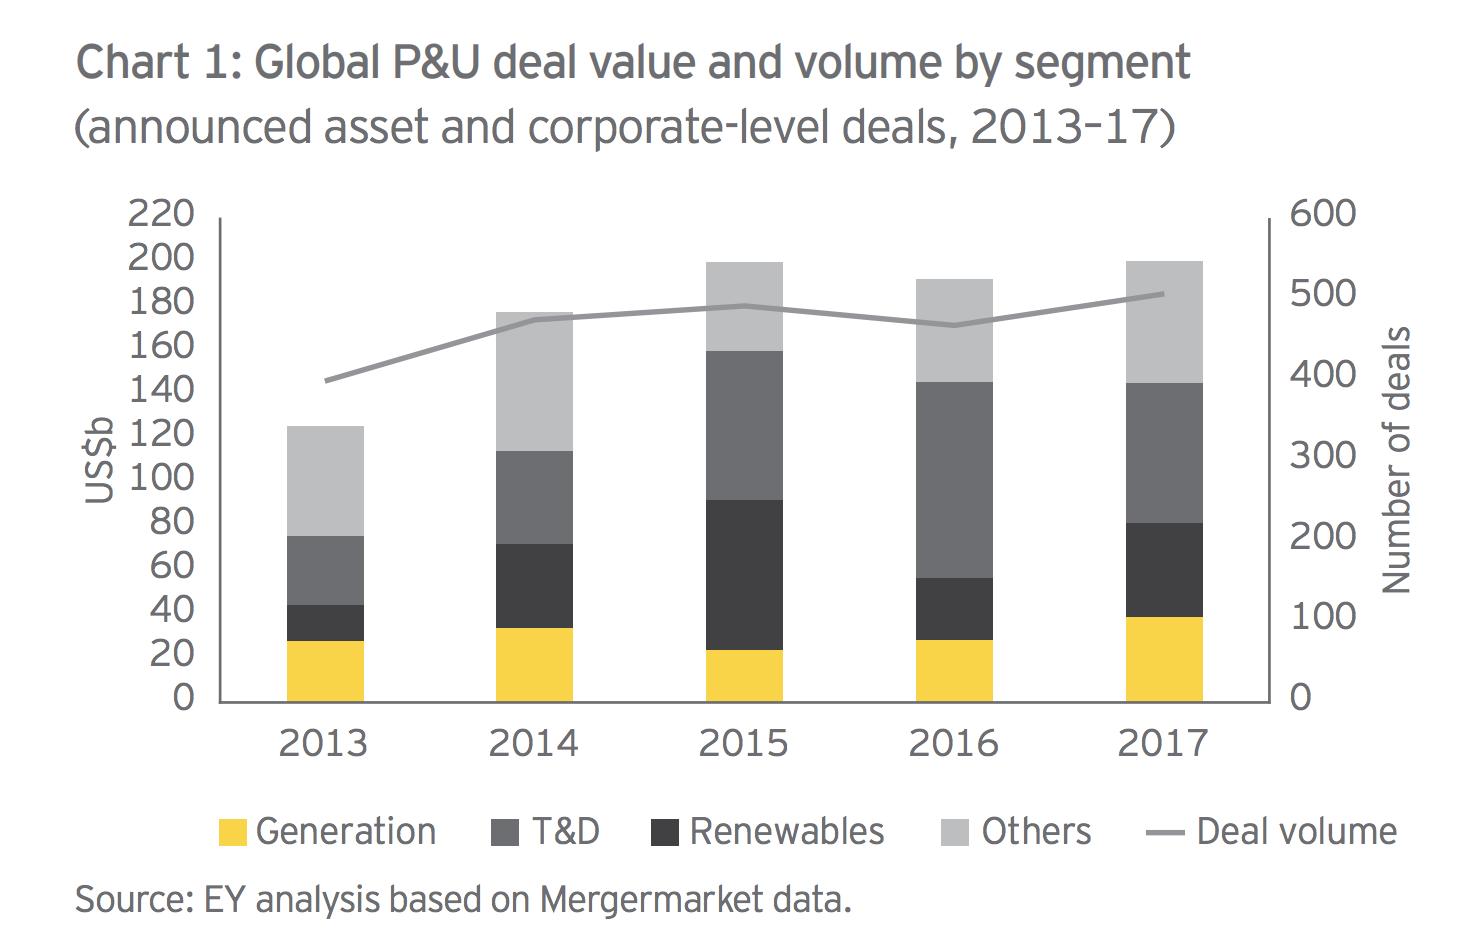 Global power industry deals